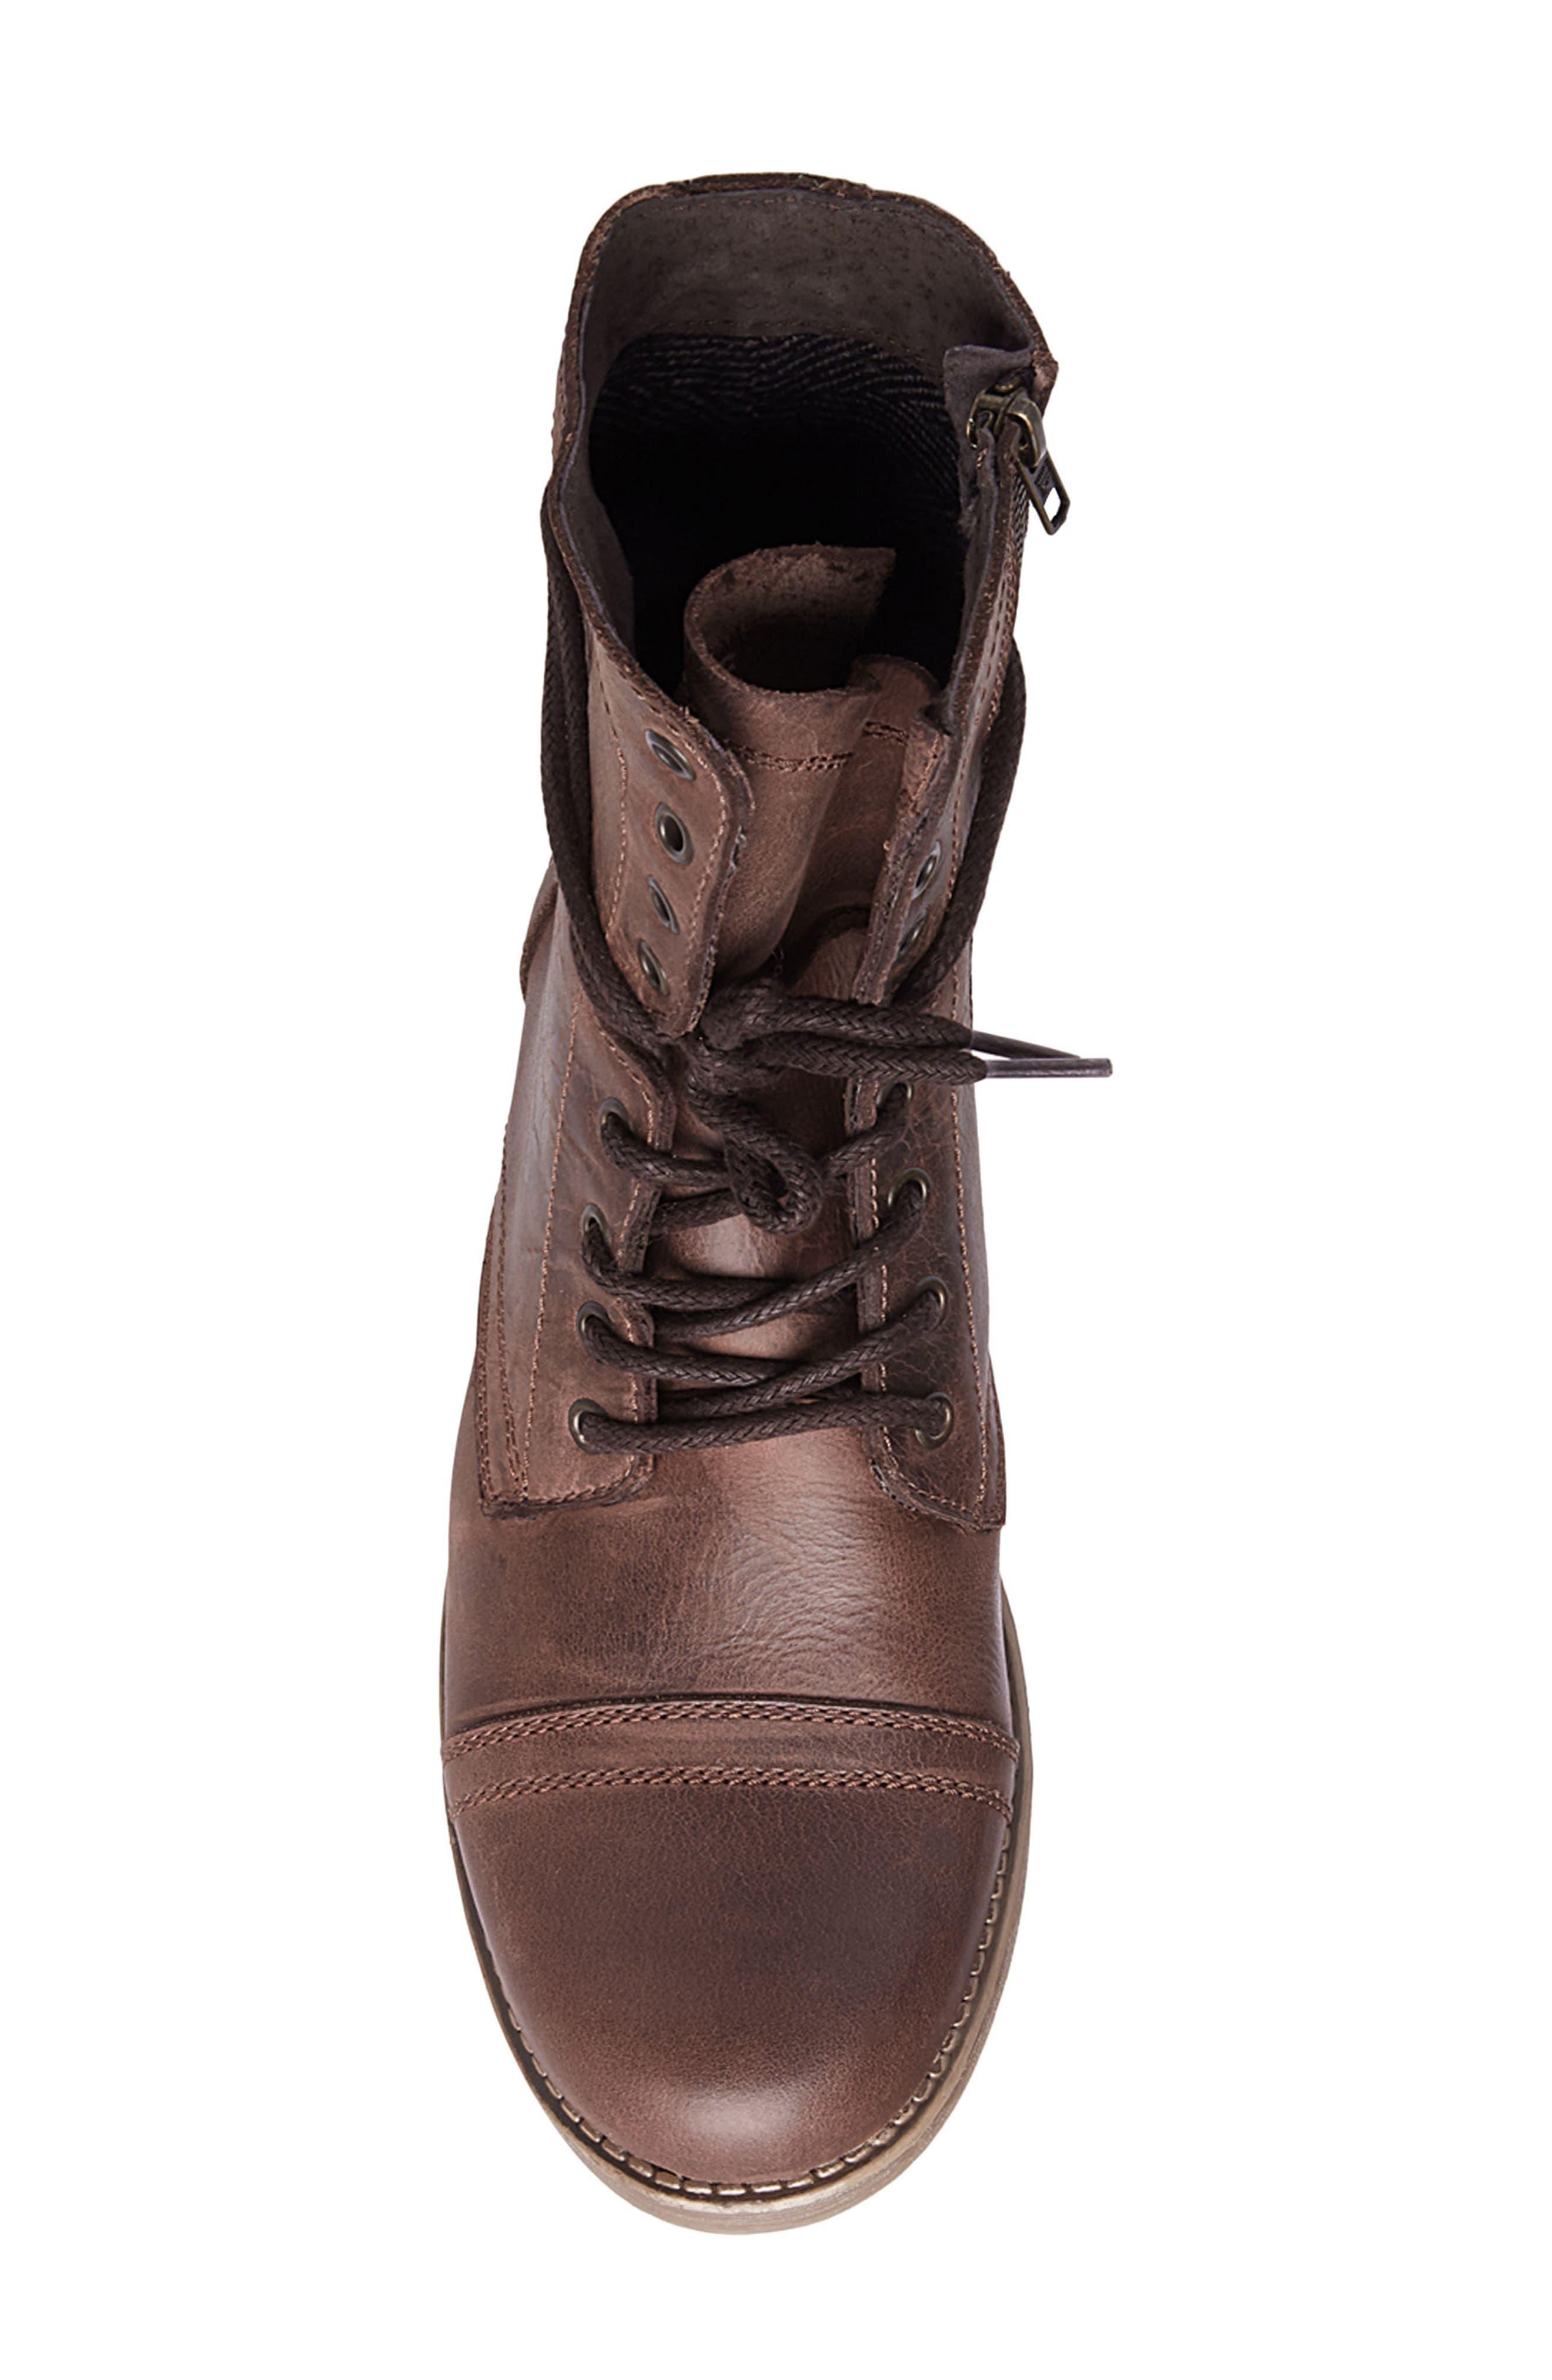 STEVE MADDEN, Troopah-C Cap Toe Boot, Alternate thumbnail 5, color, BROWN LEATHER